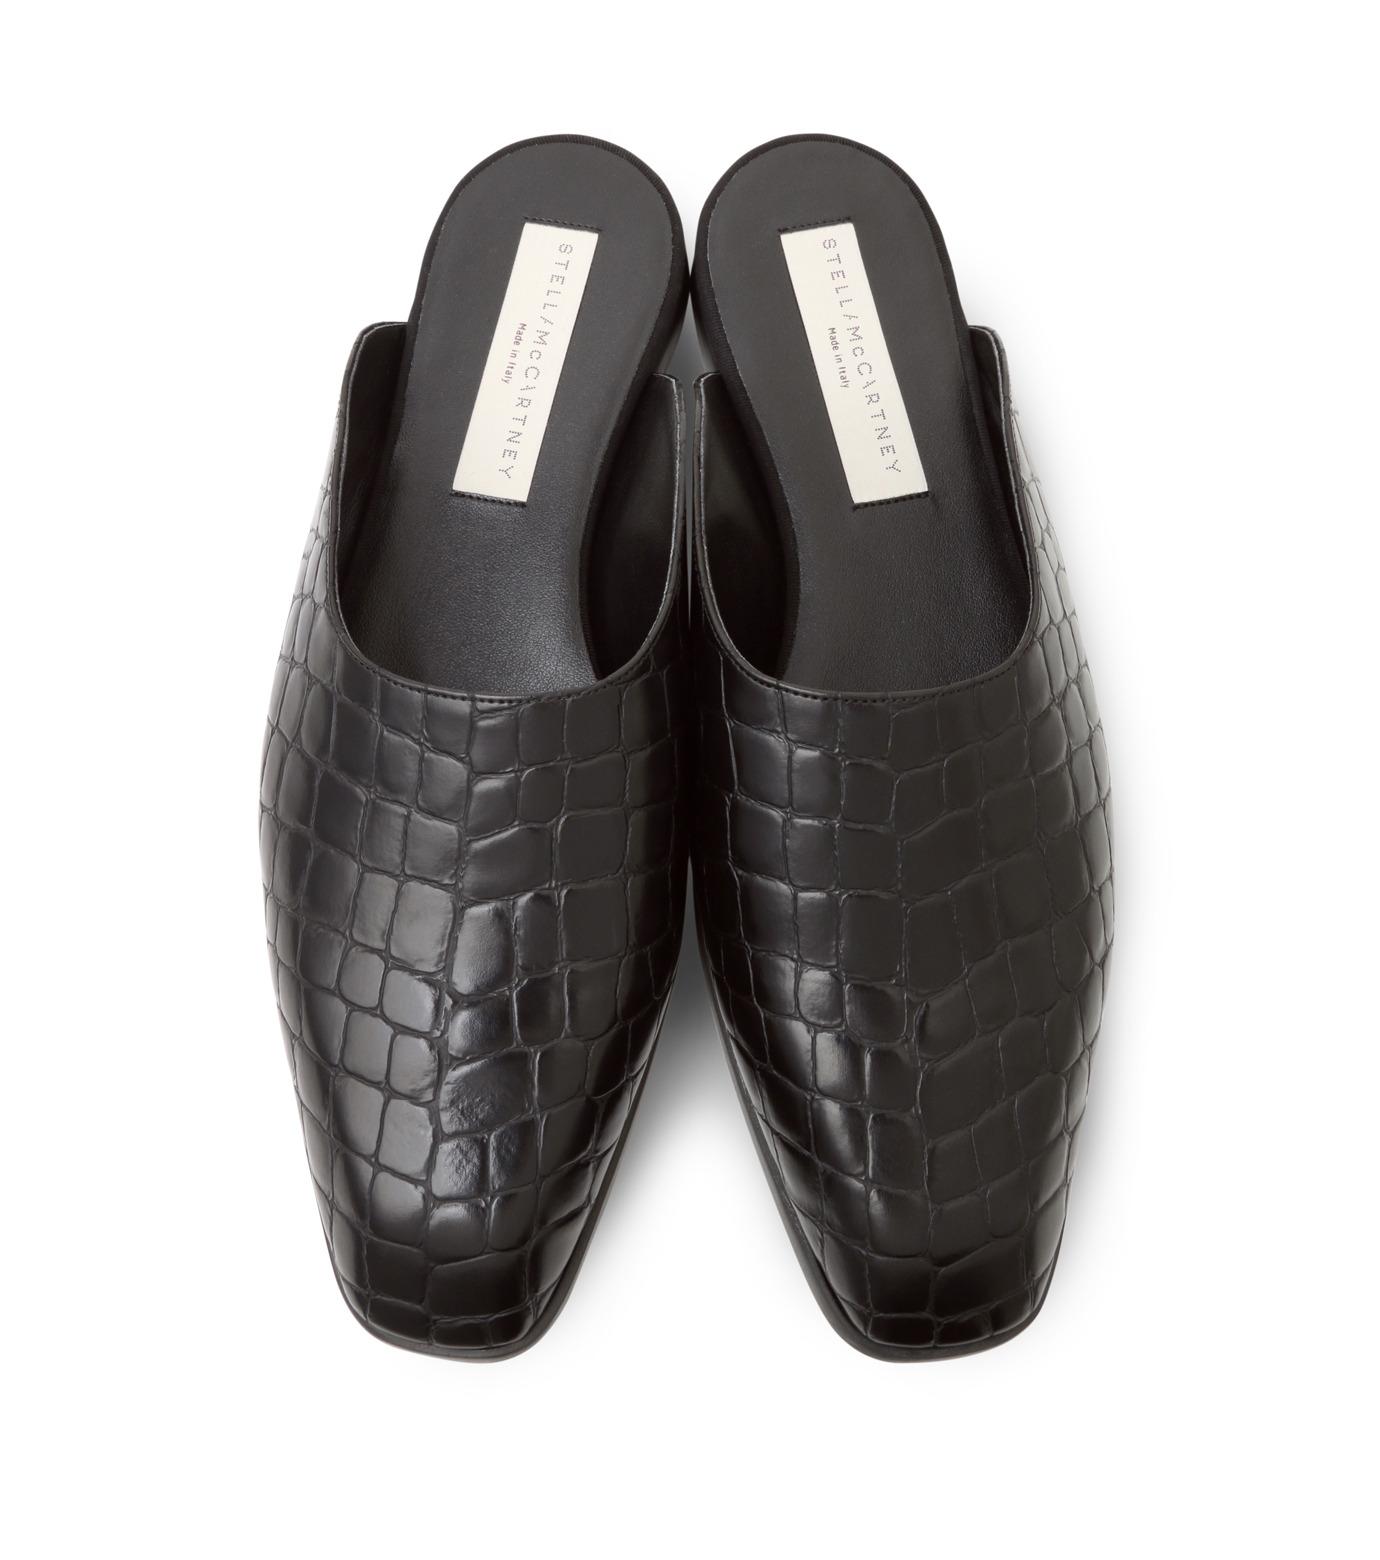 Stella McCartney(ステラマッカートニー)のCroco Moccasion-BLACK(フラットシューズ/Flat shoes)-430856-W0ZY0-13 拡大詳細画像4